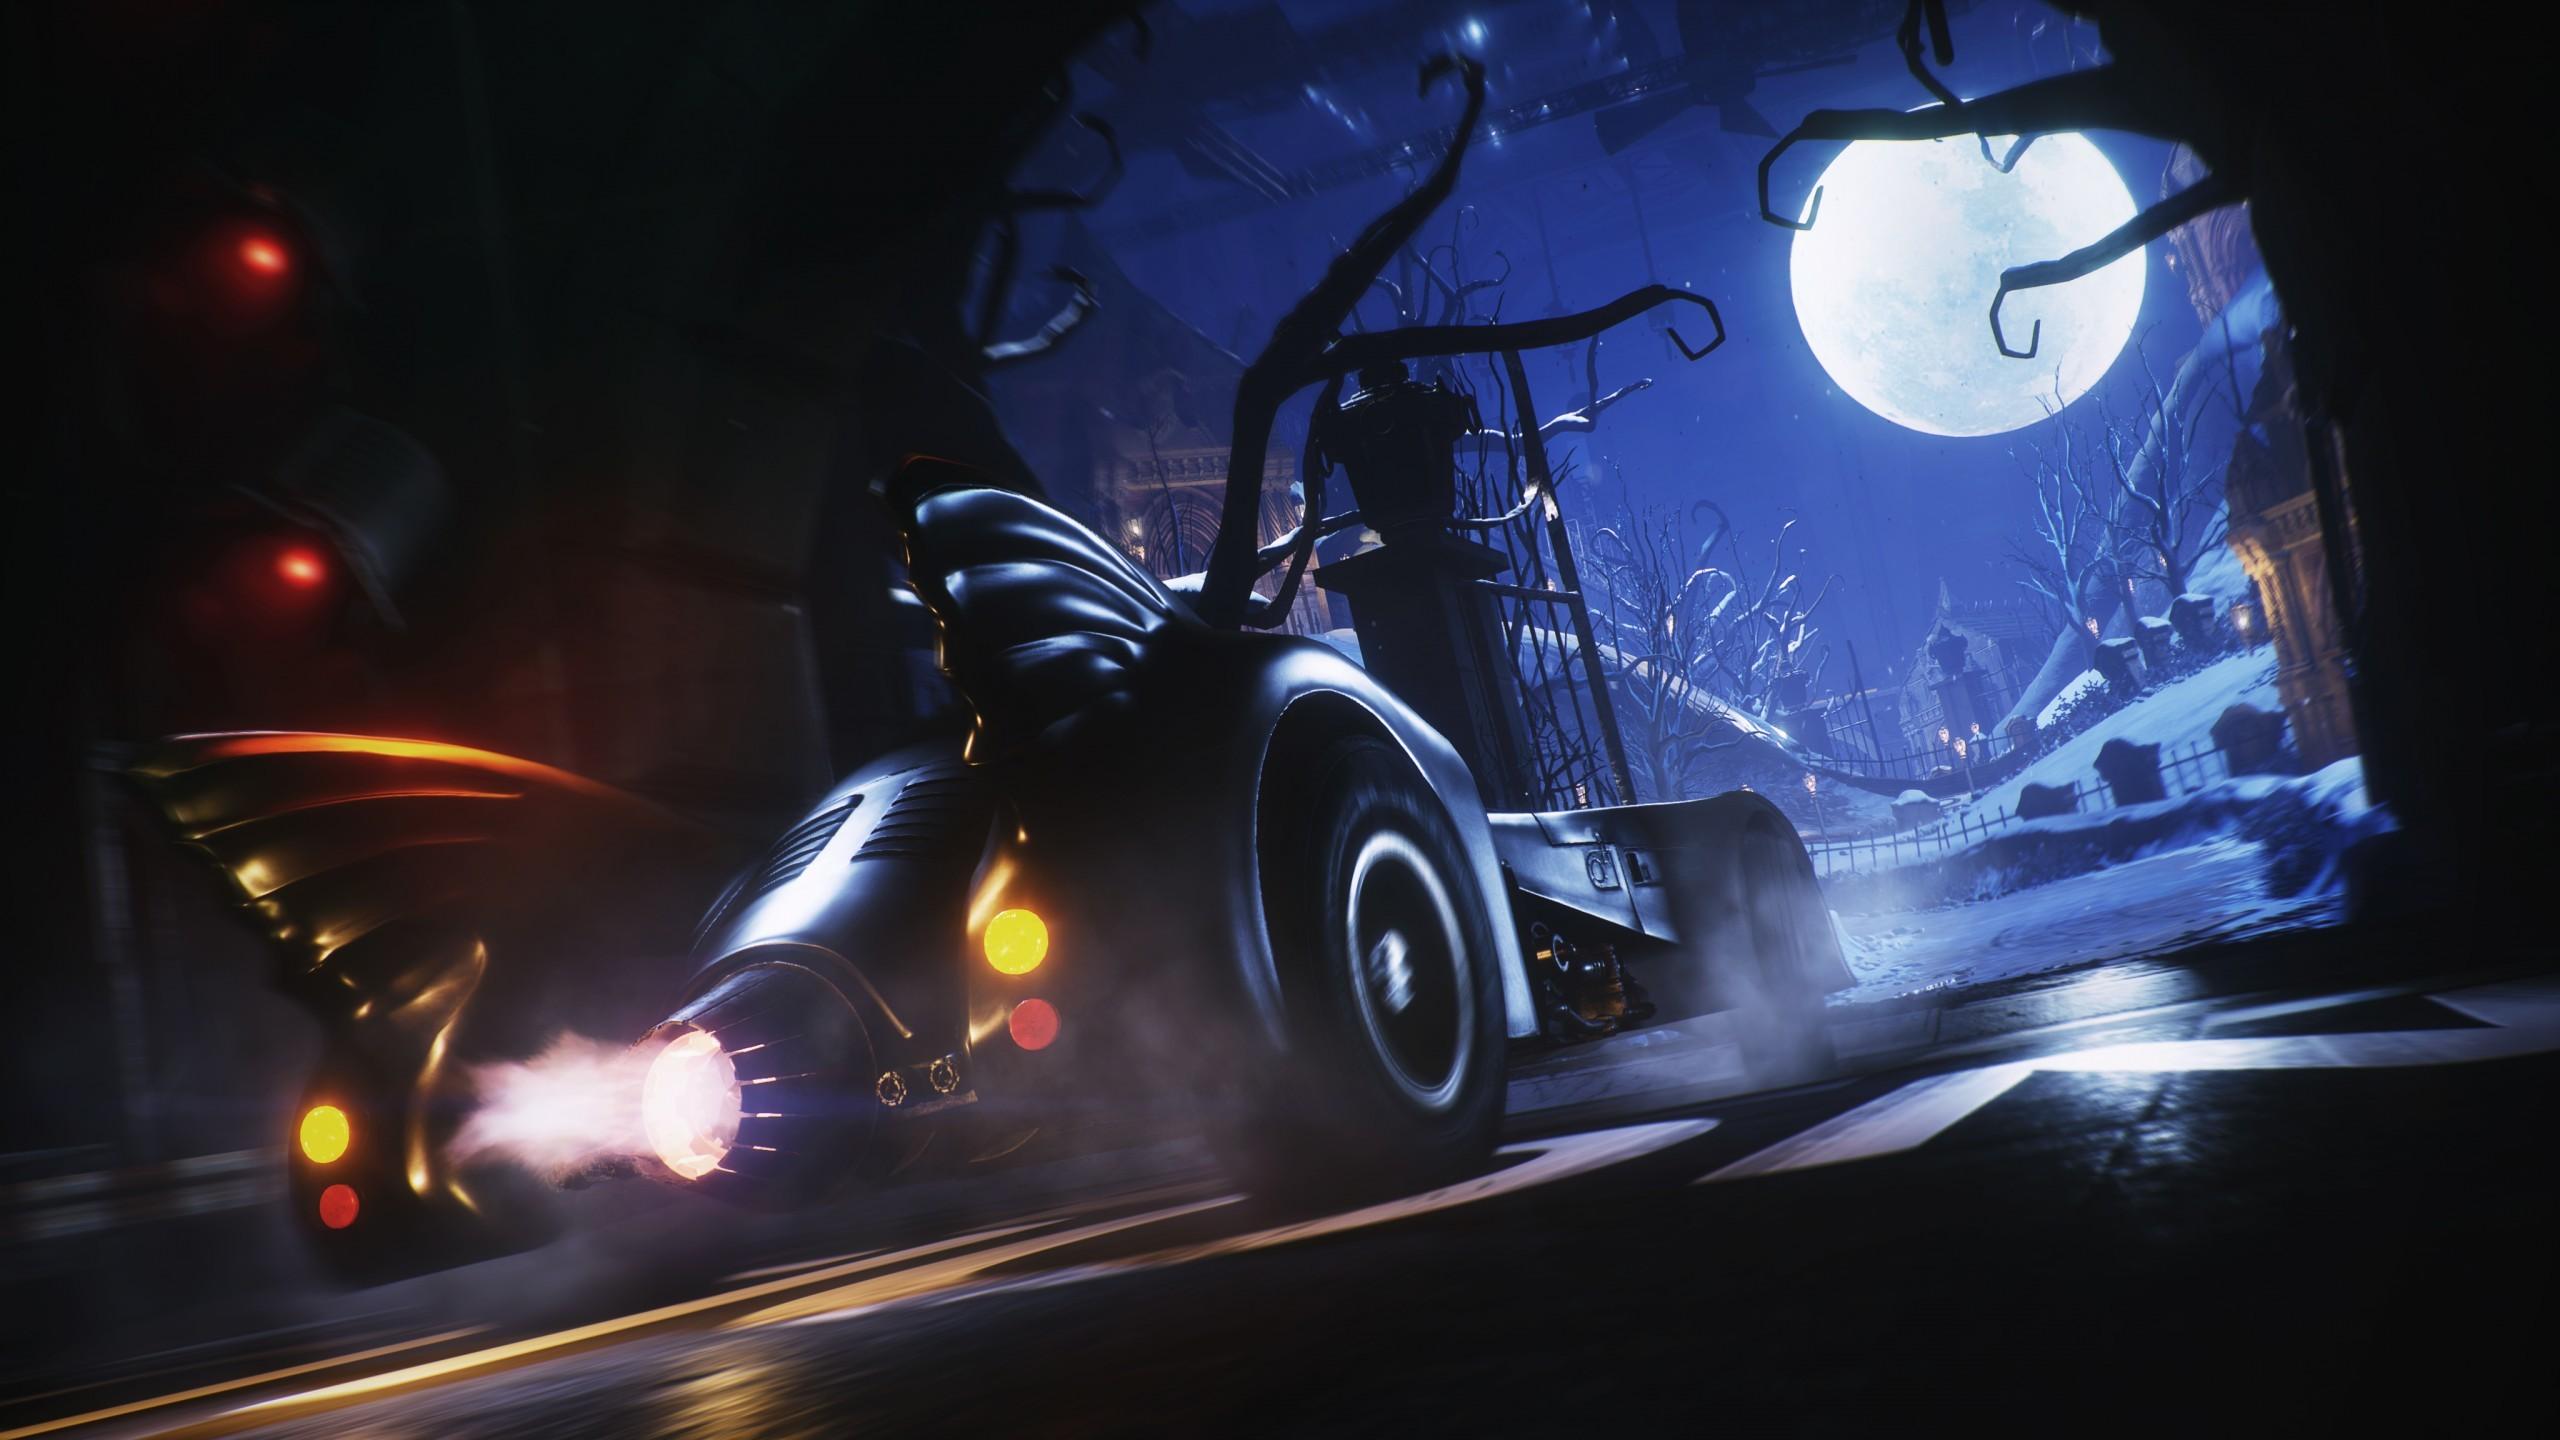 Games / Batman Wallpaper. Batman, Arkham Knight, Batmobile Pack, 4K